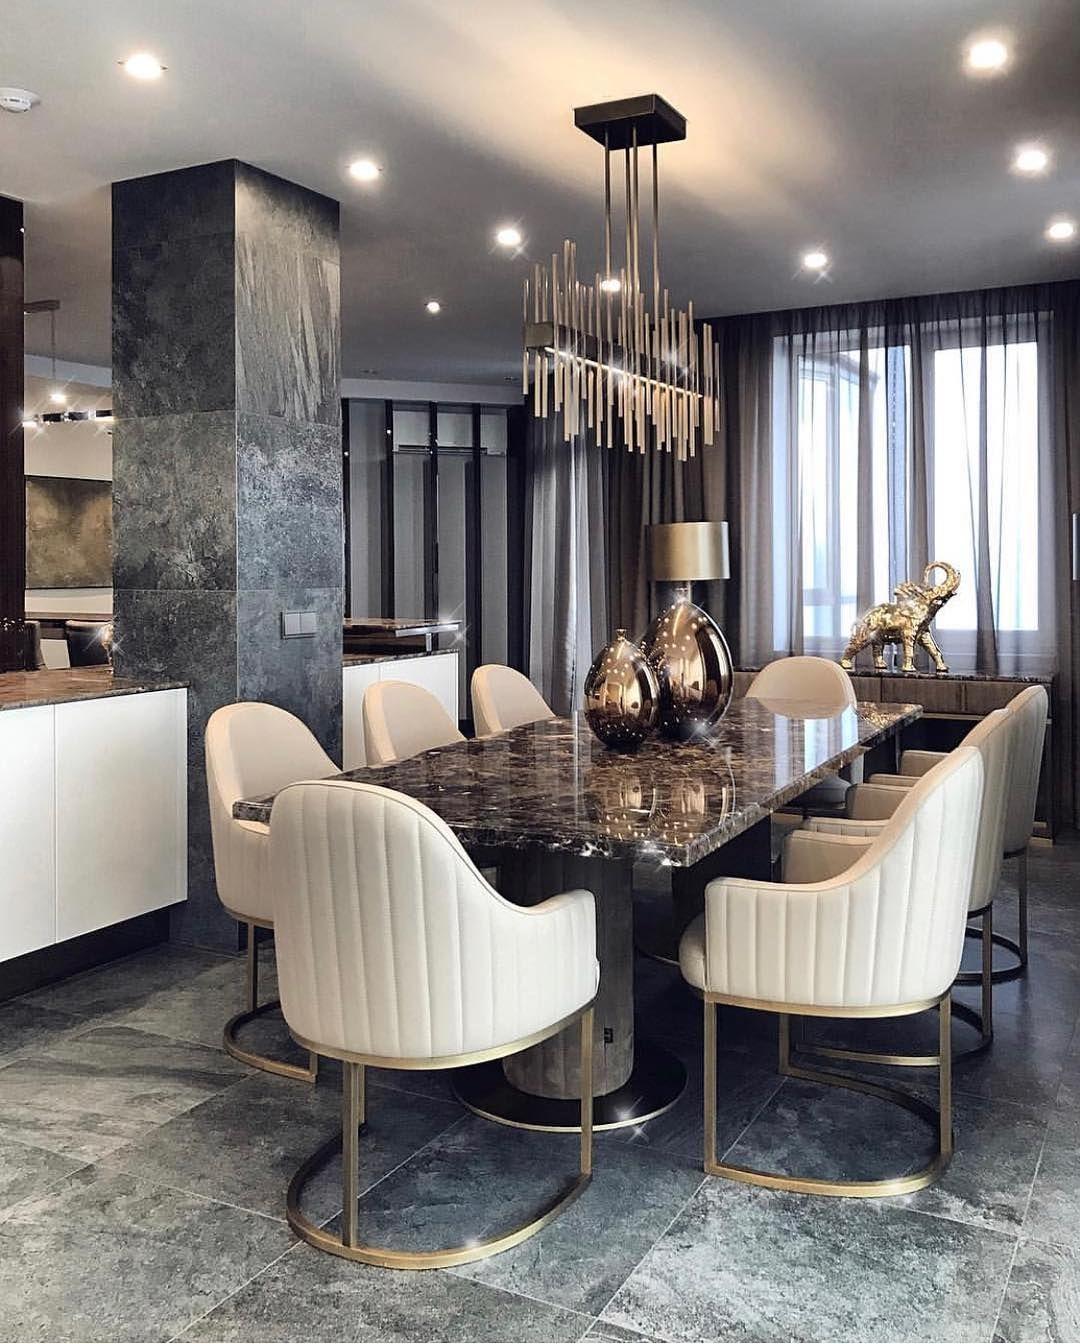 Dining Room Home Decor Inspirations For Your Next Interior Design